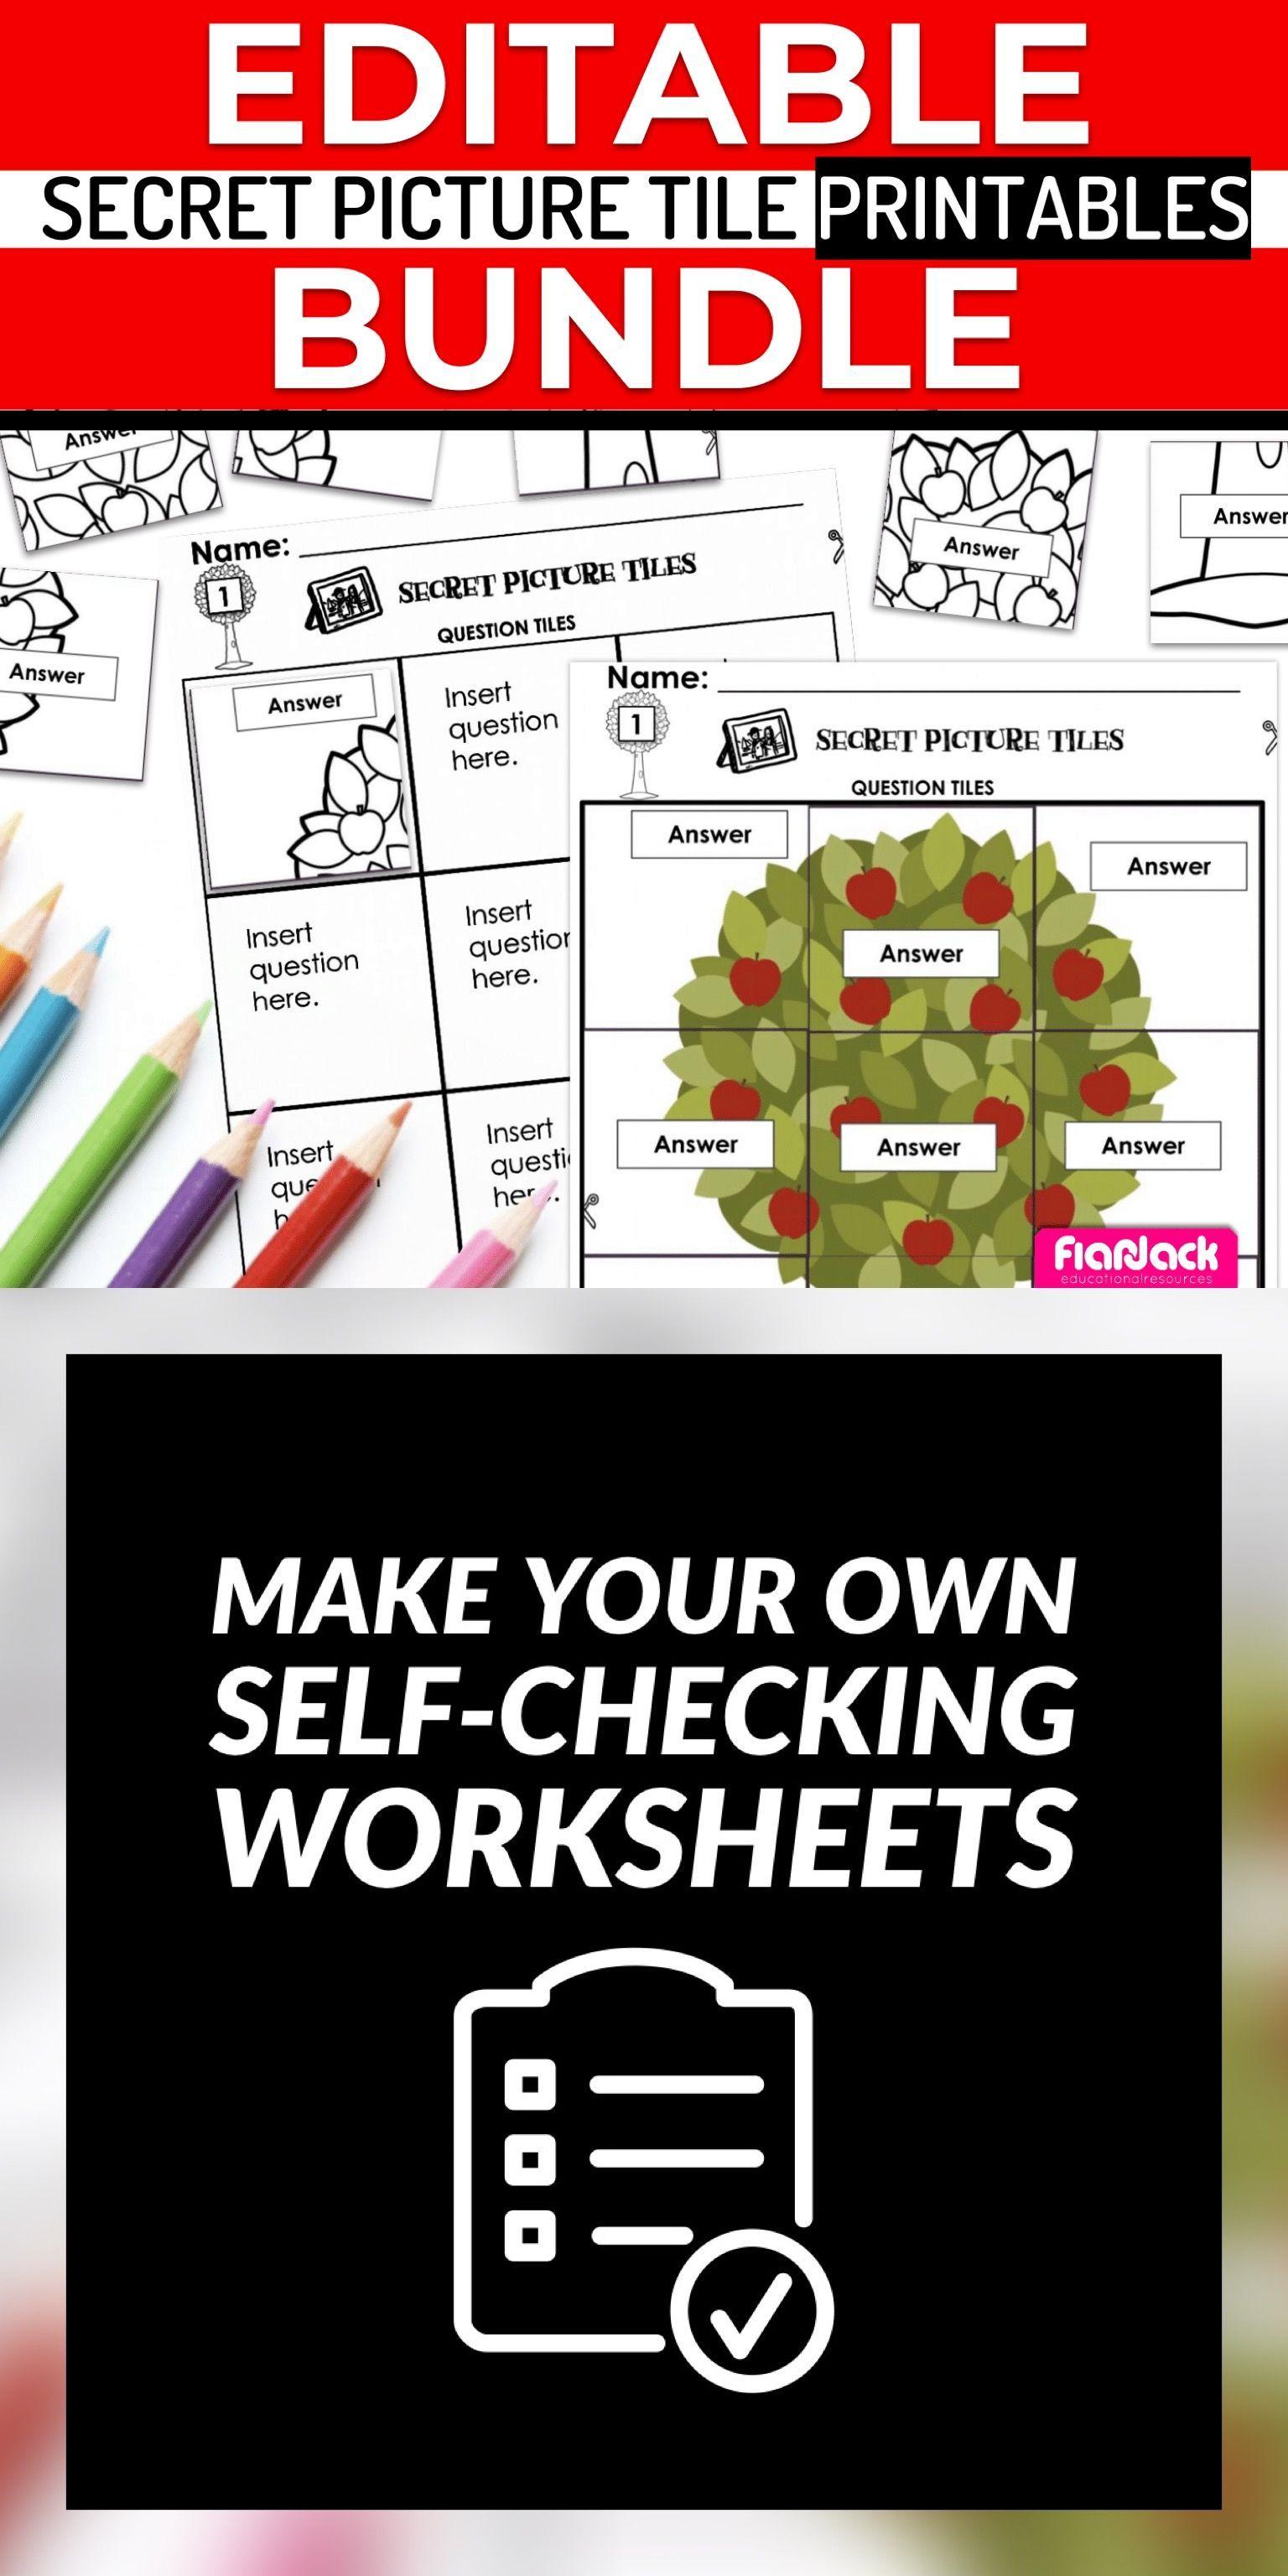 Editable Secret Picture Tile Printables Seasonal Bundle